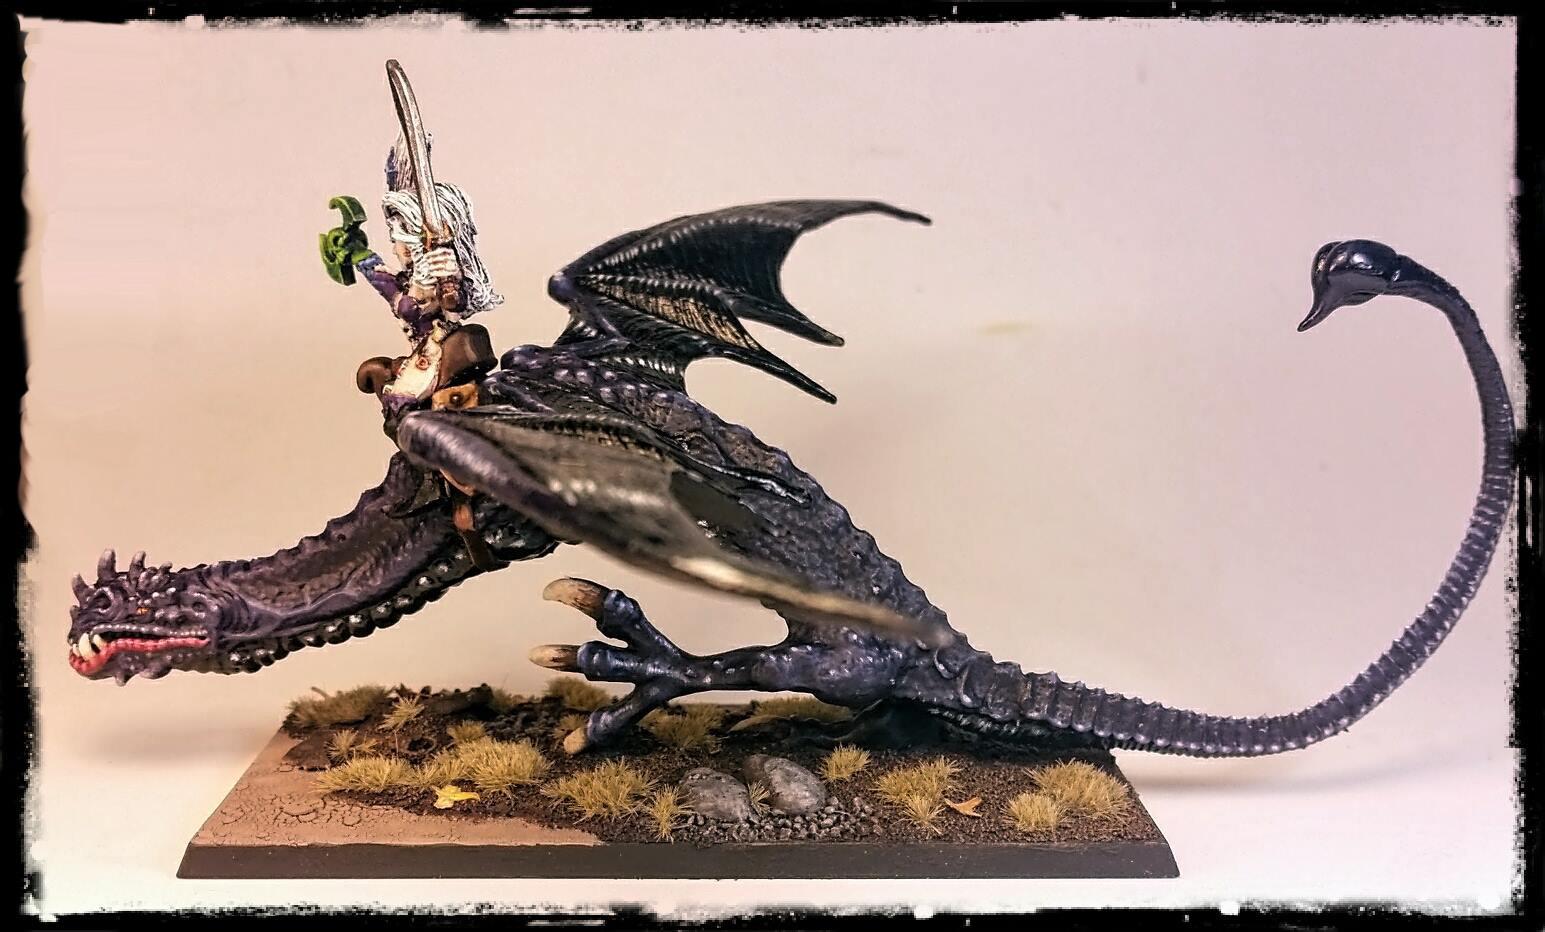 Scale Creep Dragon Metal Tag Ii Djh Mee And Joh Dee